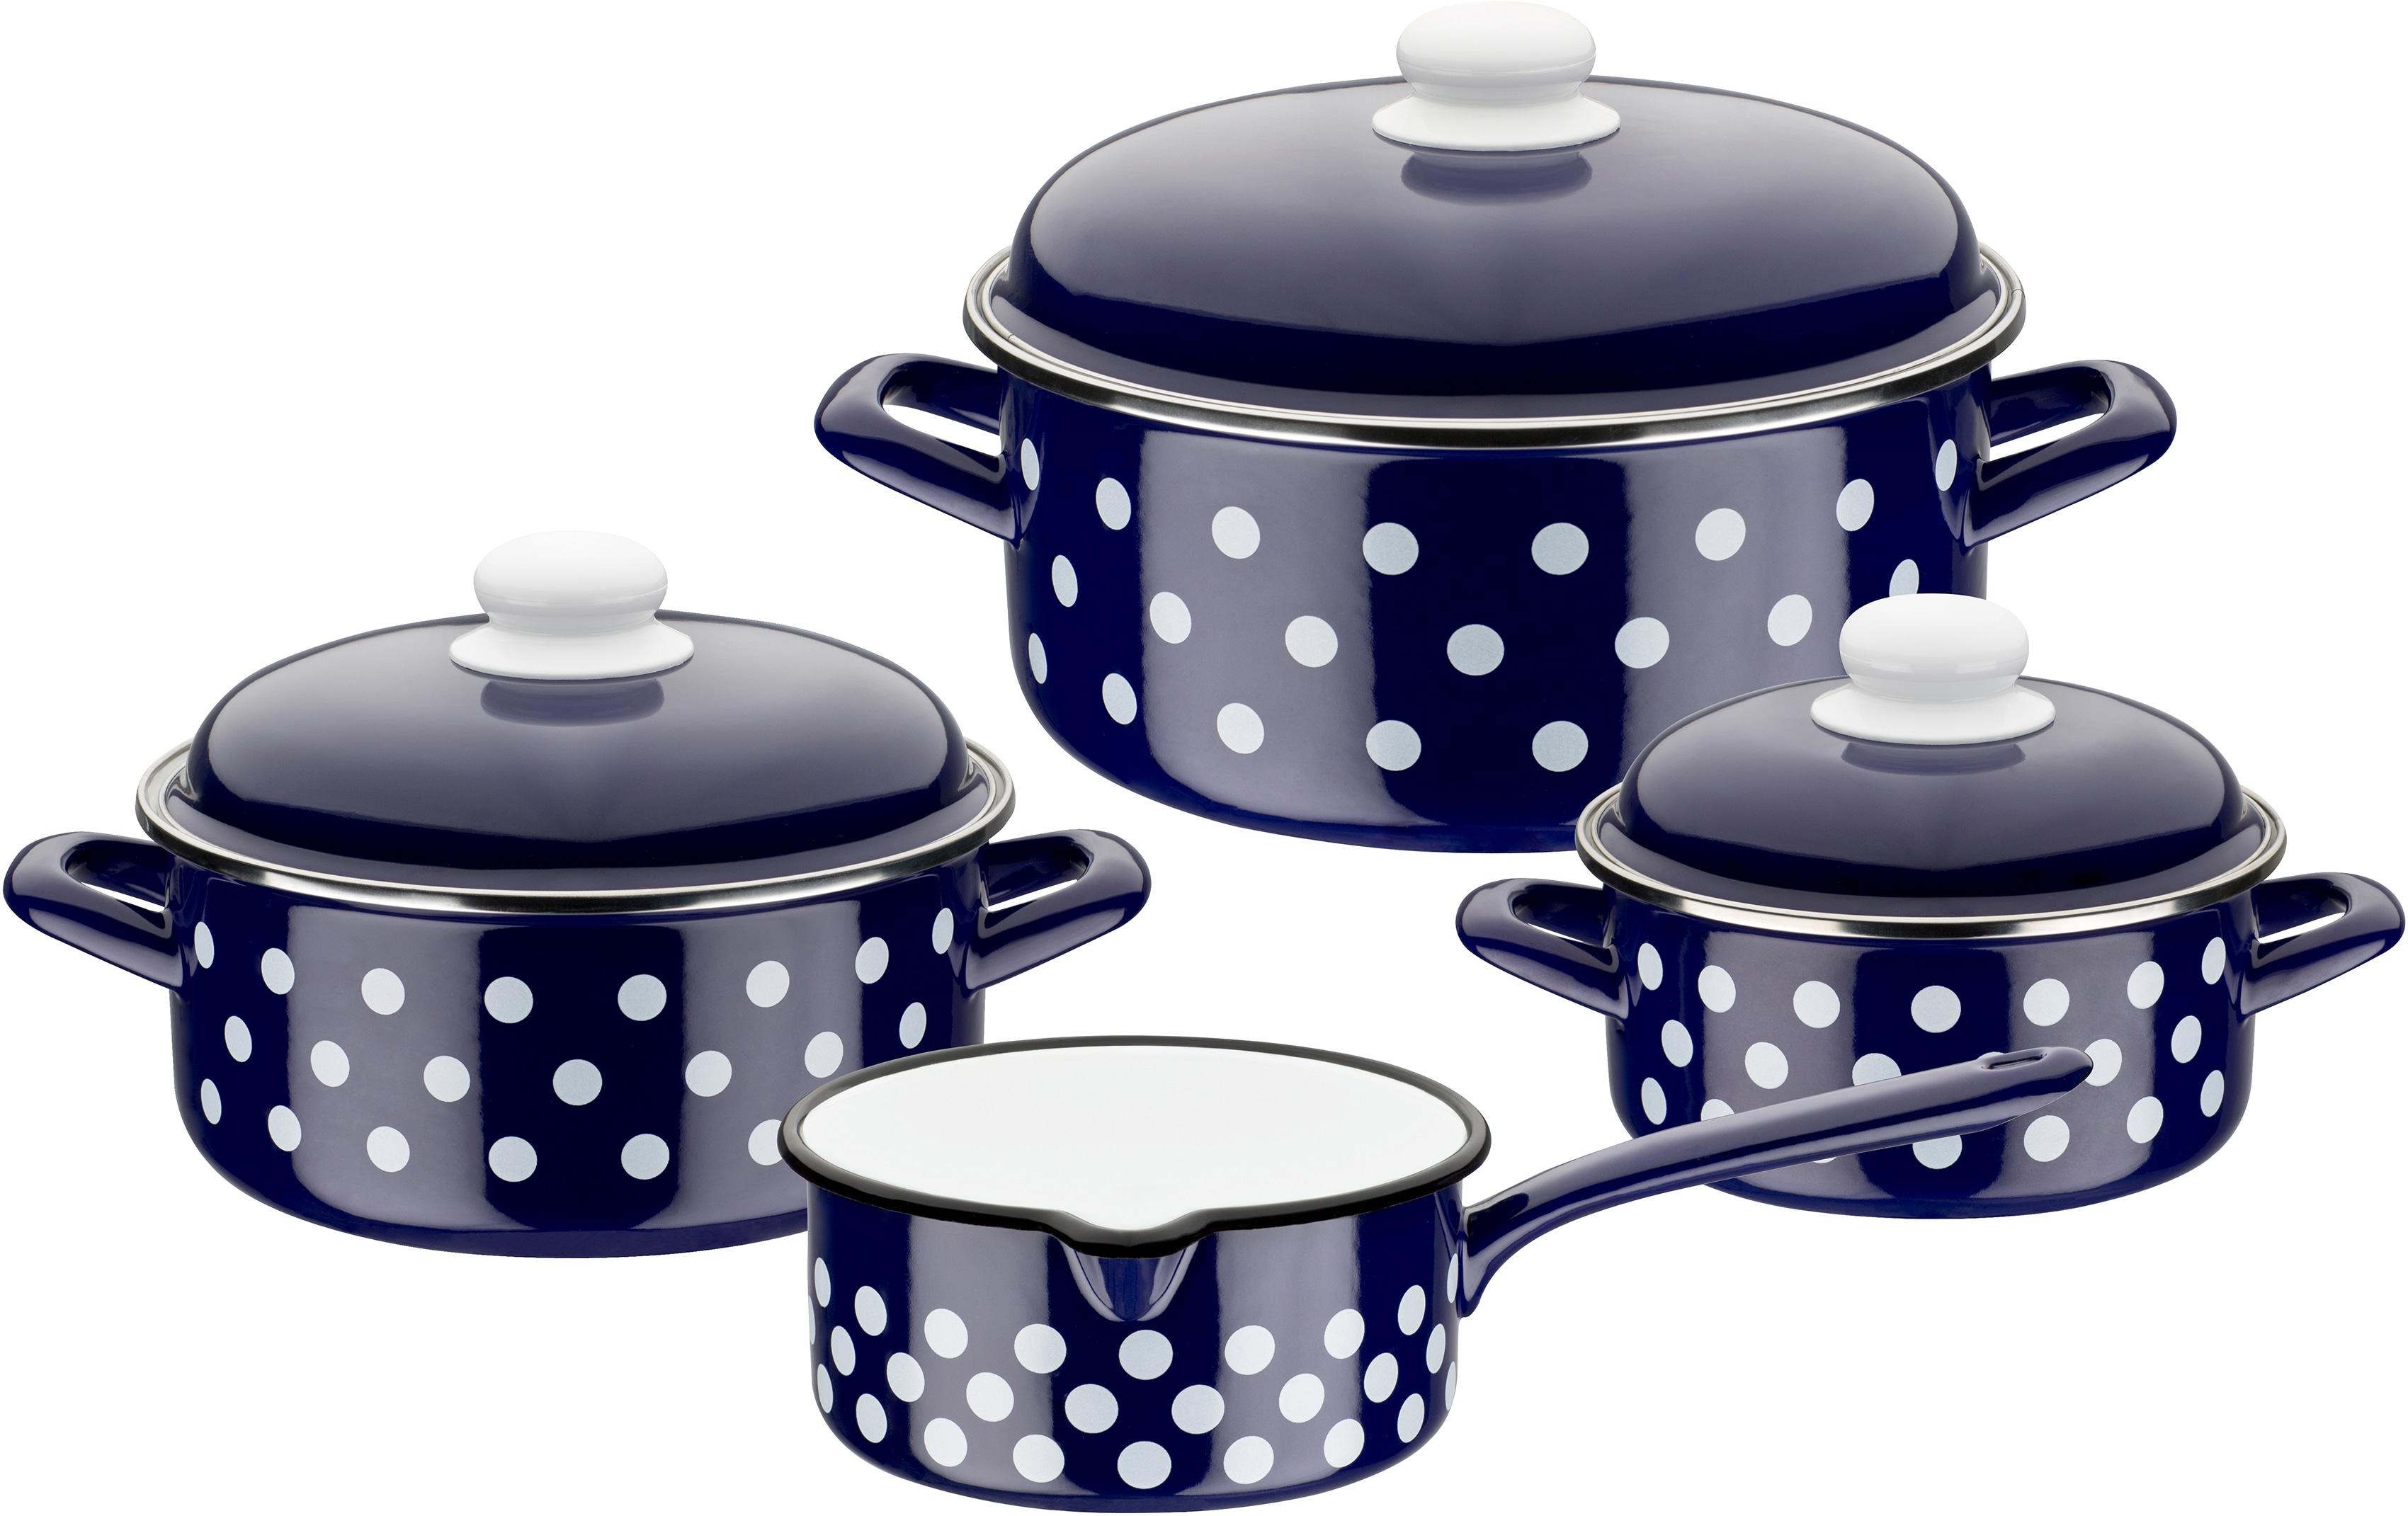 GSW Topf-Set, Stahl-Emaille, (Set, 7 tlg.), inkl. Literskala, Induktion blau Topf-Set Topfsets Töpfe Haushaltswaren